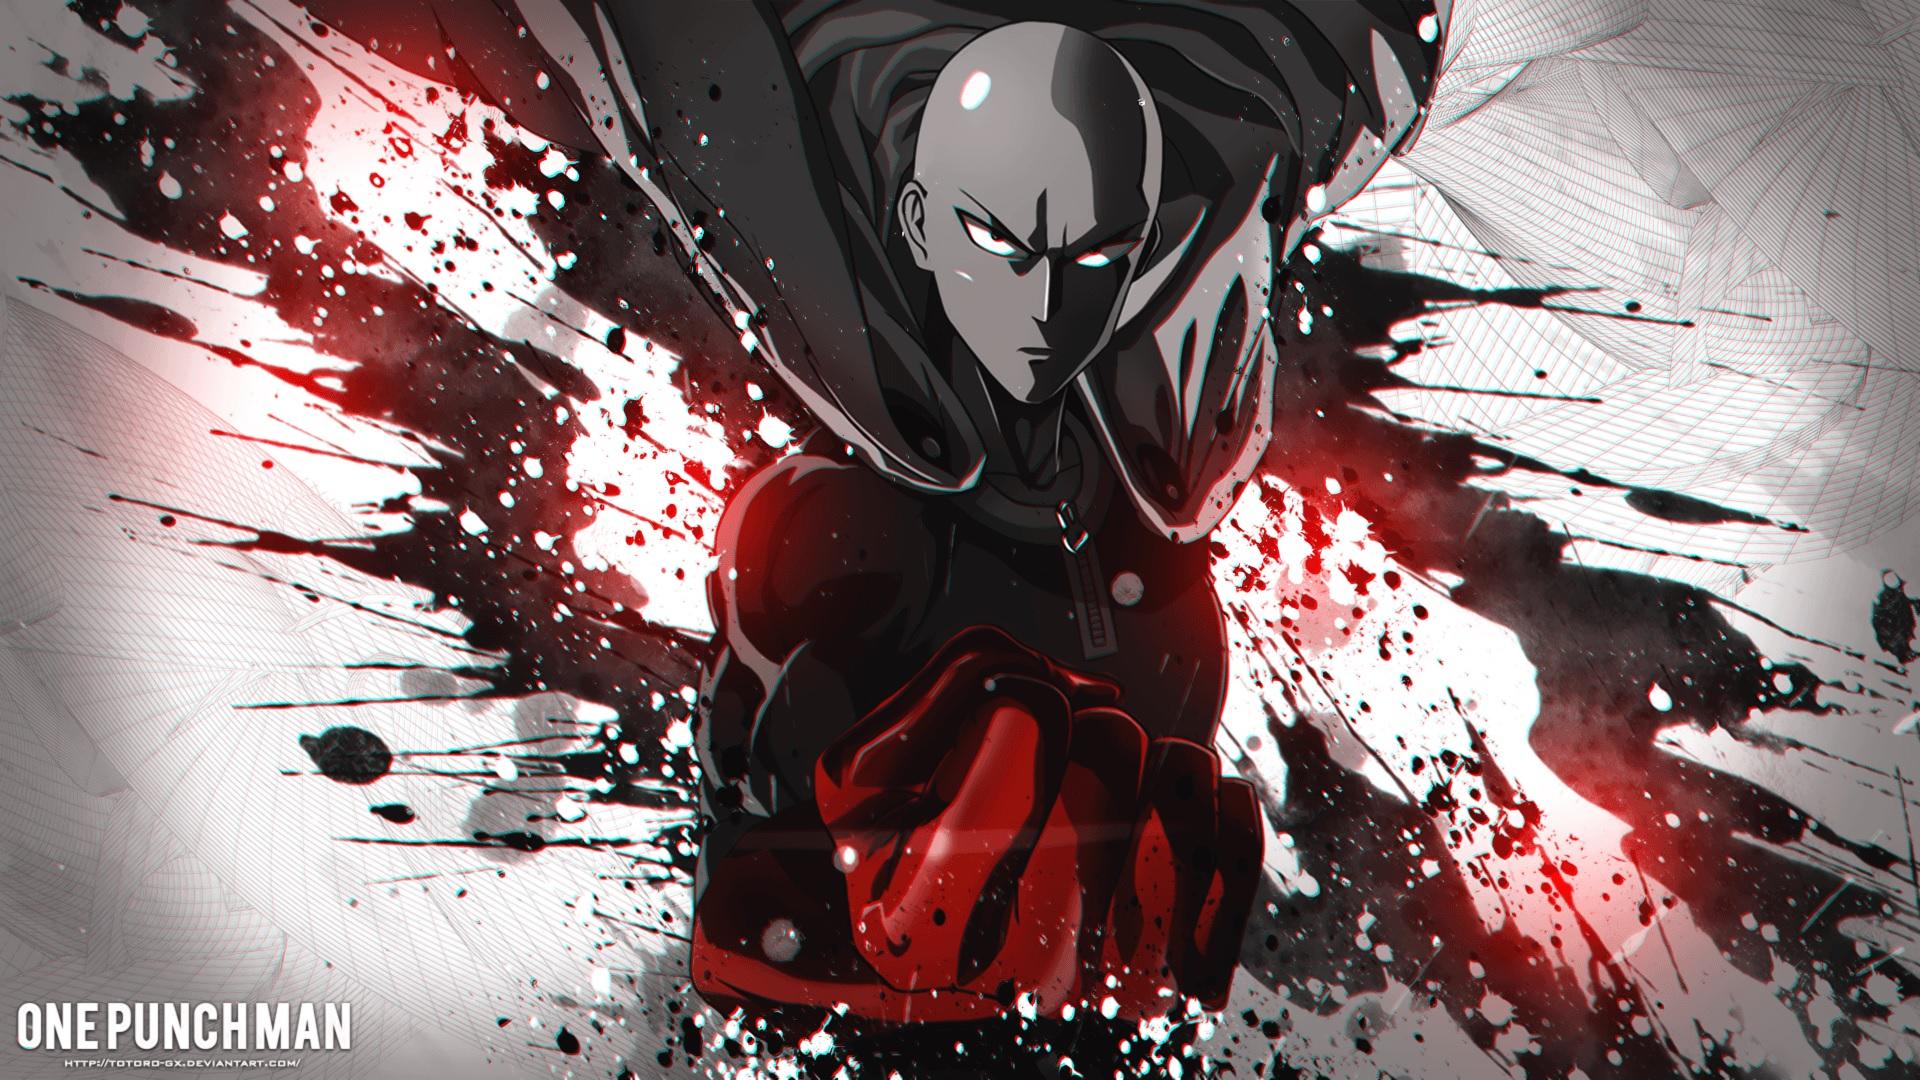 One Punch Man Season 2 wallpaper